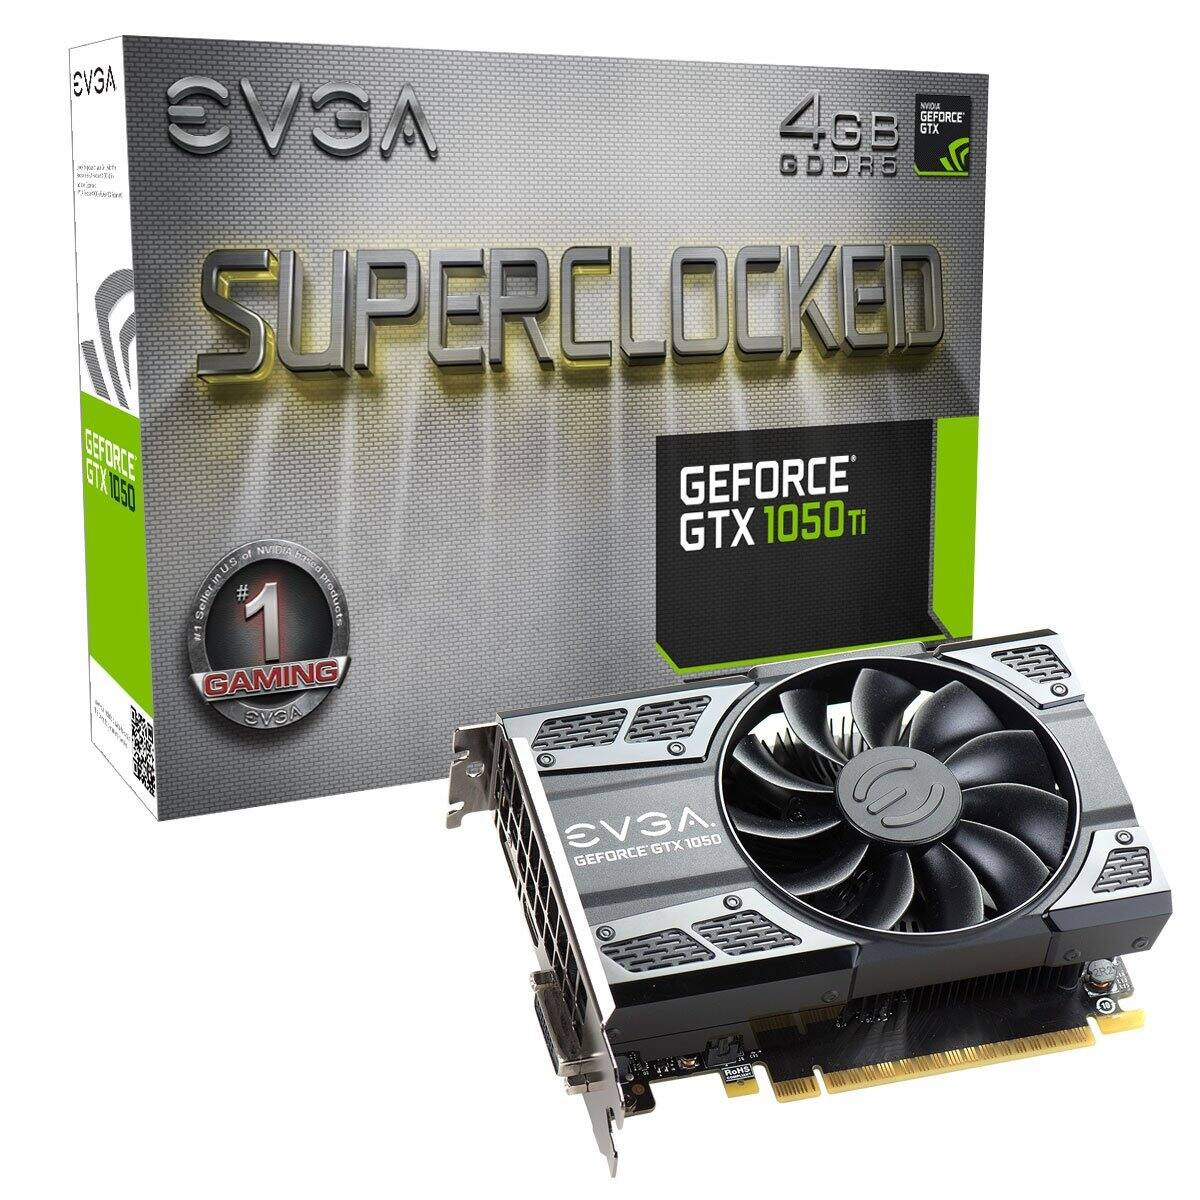 EVGA GeForce GTX 1050 Ti SC SuperClocked Graphics Card, 4GB GDDR5 $129 woot.com